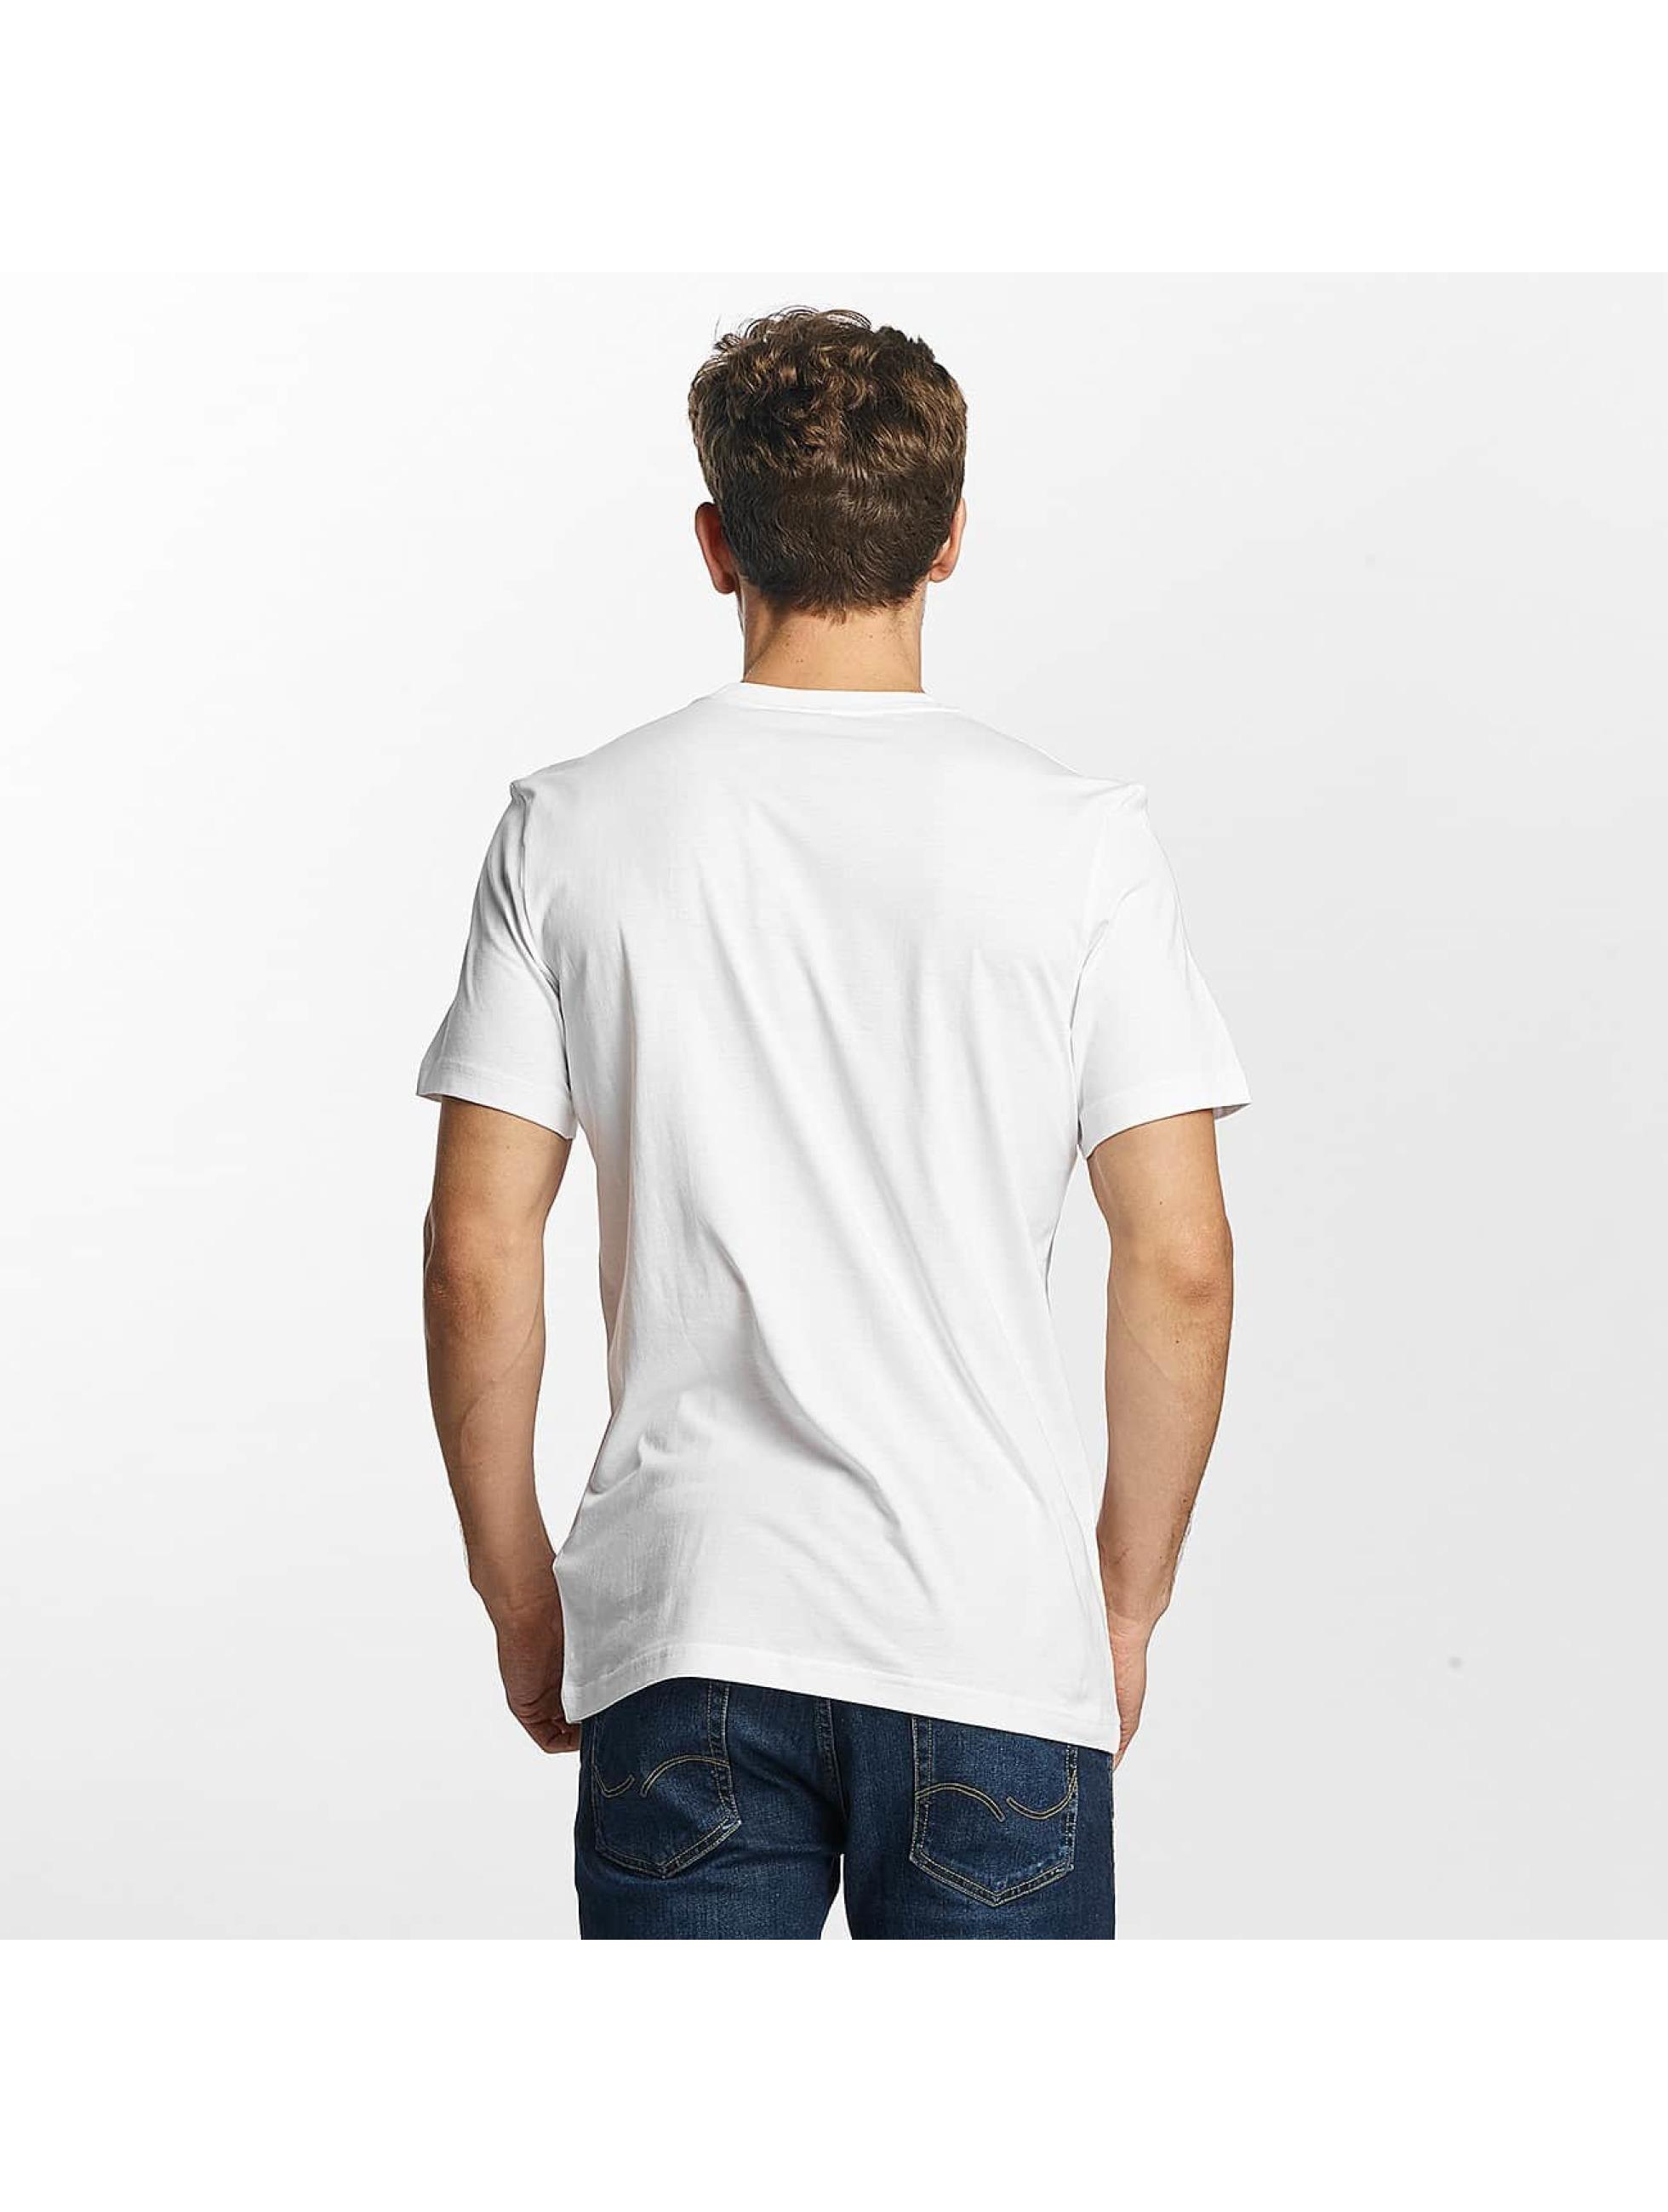 adidas T-Shirt Tongue Label 1 weiß